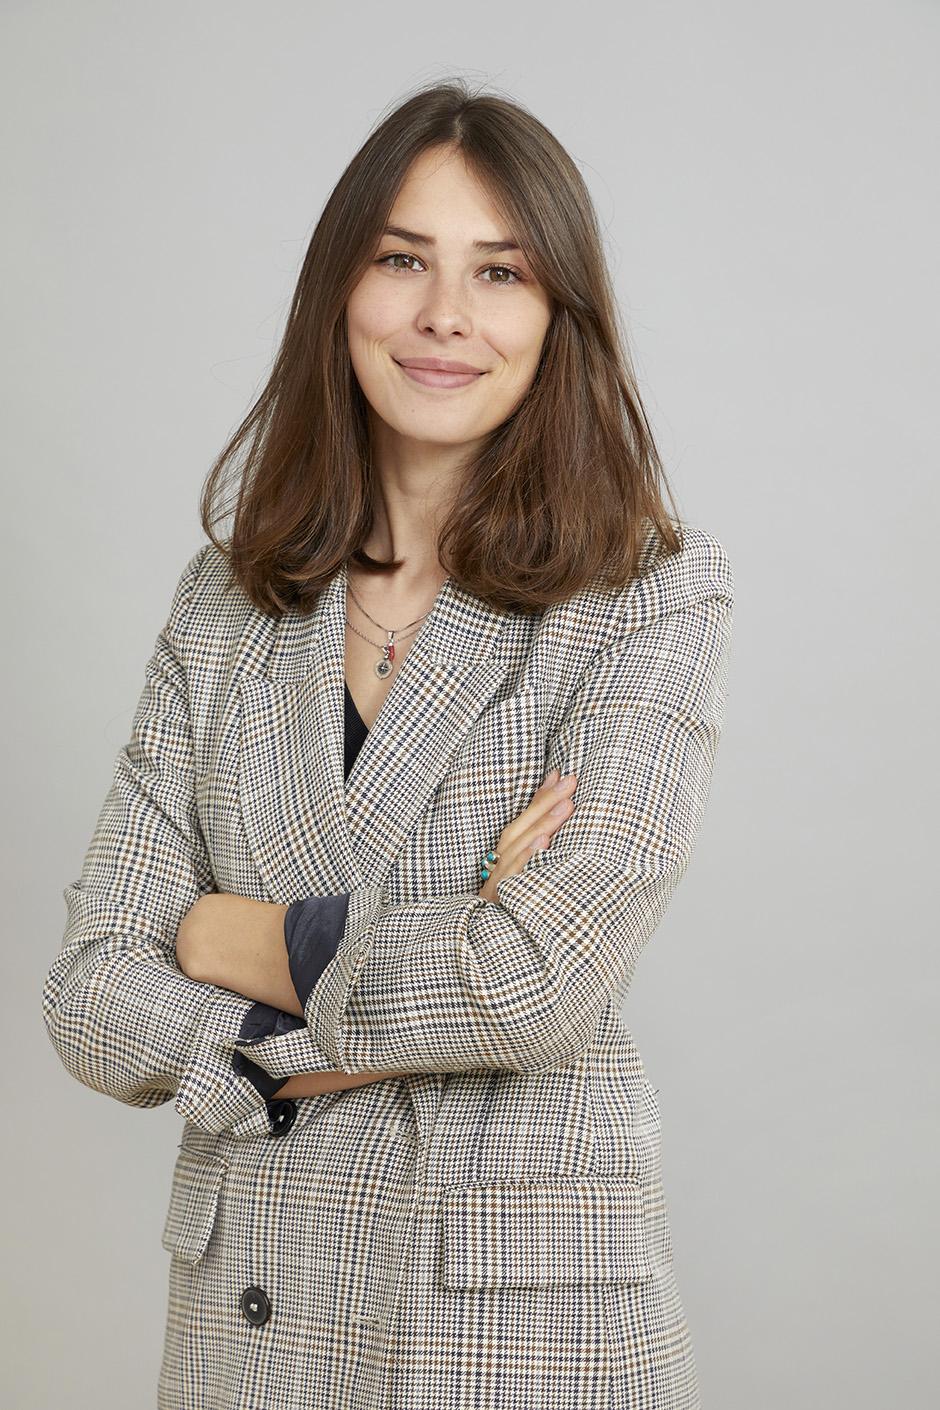 Chiara Bertolini